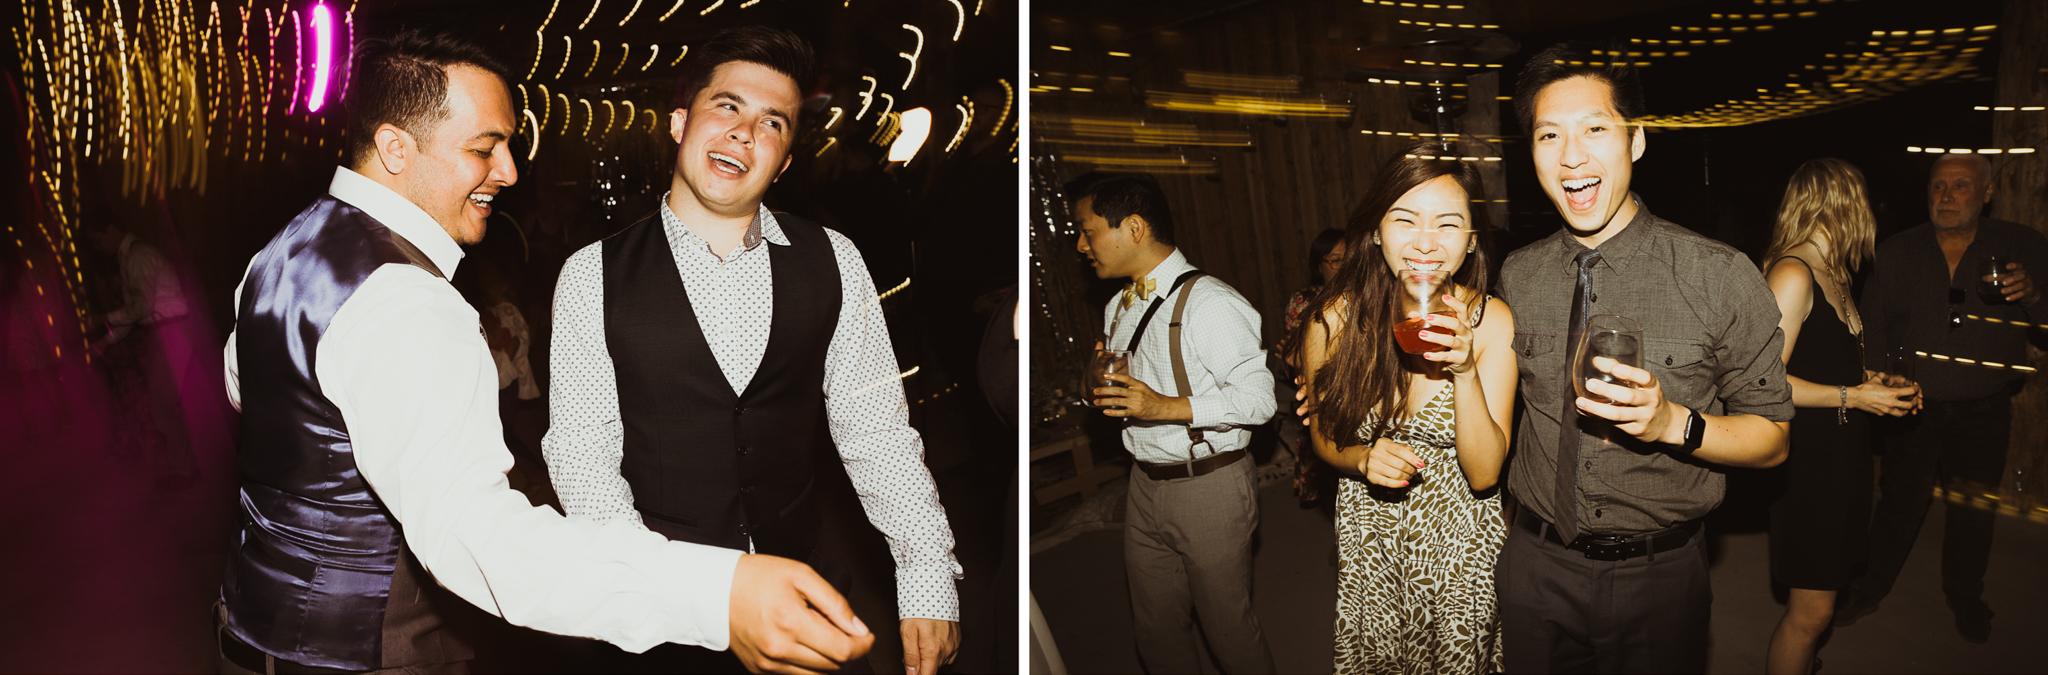 ©Isaiah & Taylor Photography - The Hideout, Kirkwood CA wedding -13.jpg